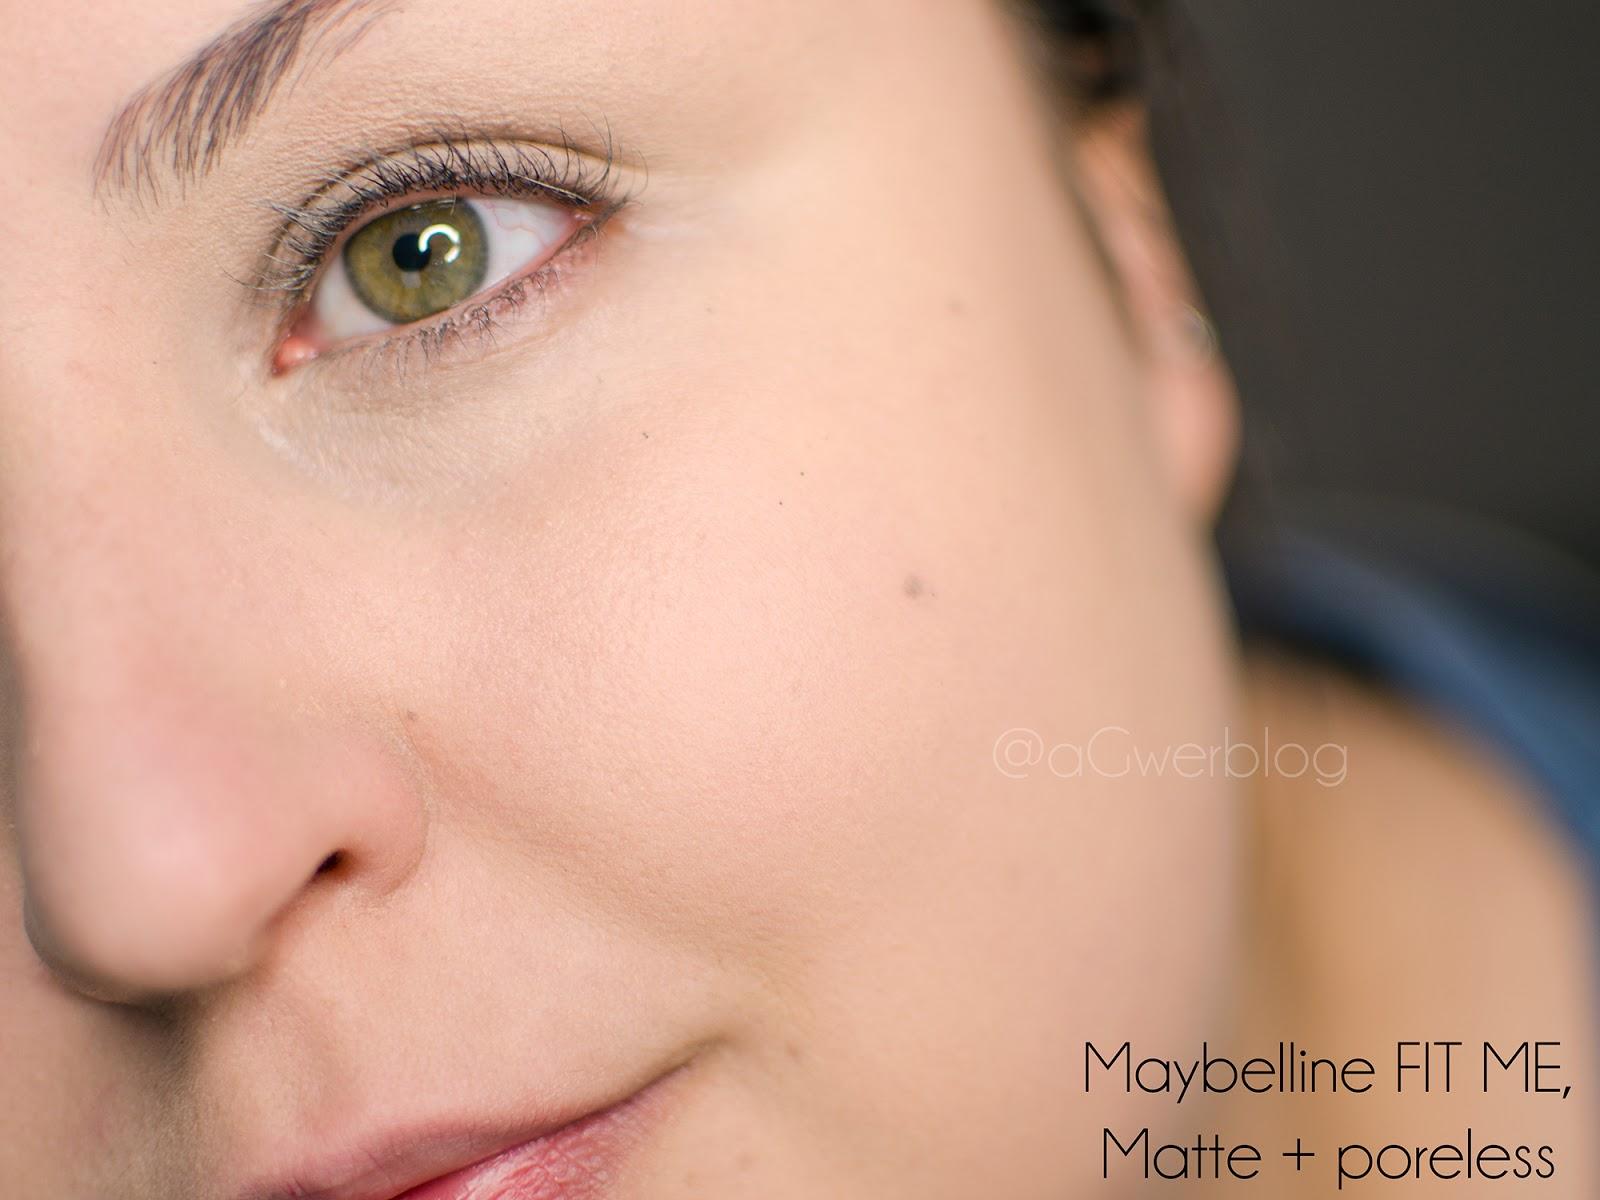 Maybelline-fit-me-Matte-poreless